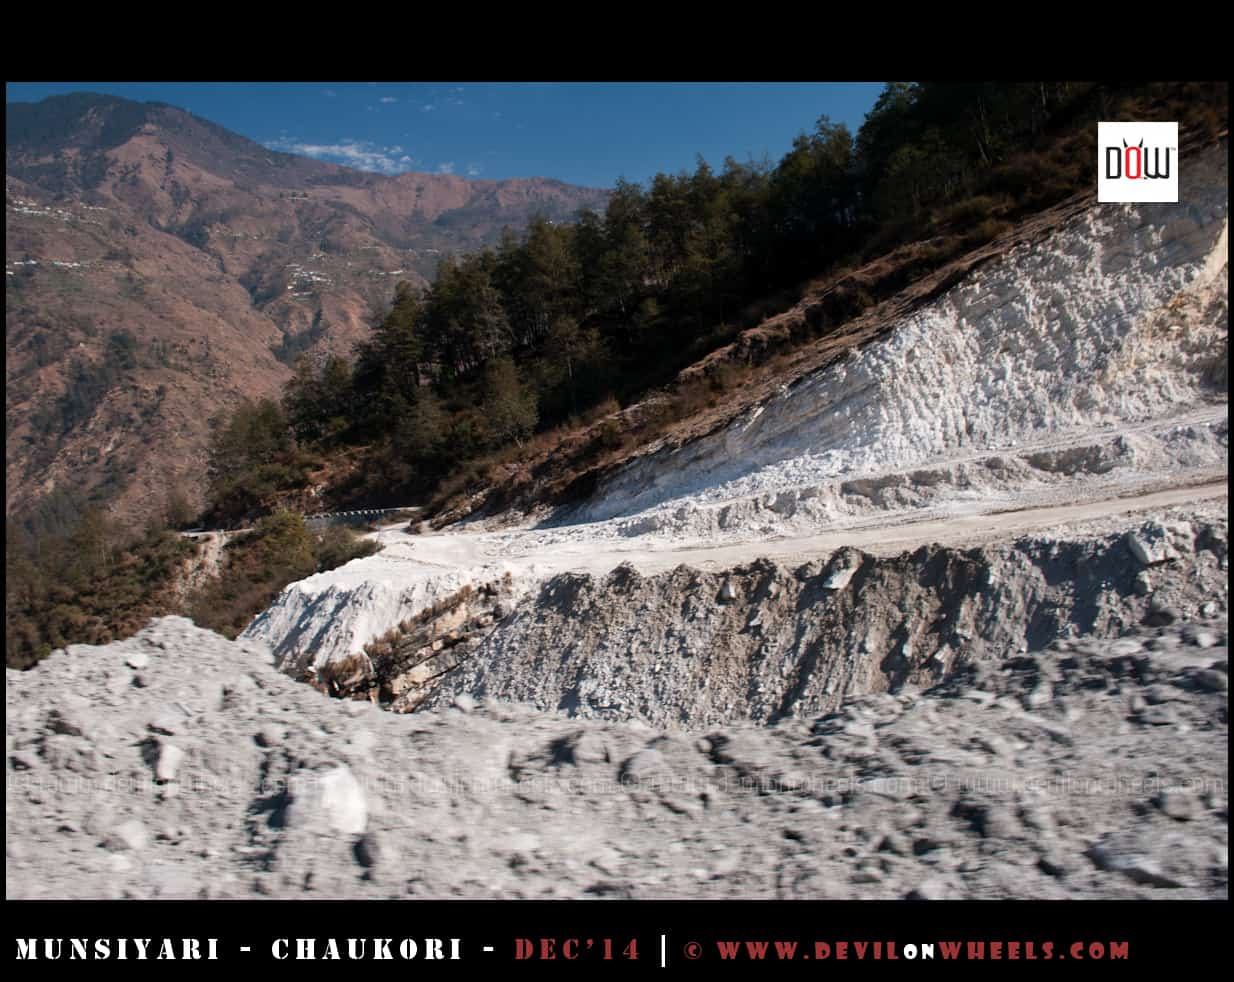 Road conditions between Munsiyari - Madkote - Jaulijibi